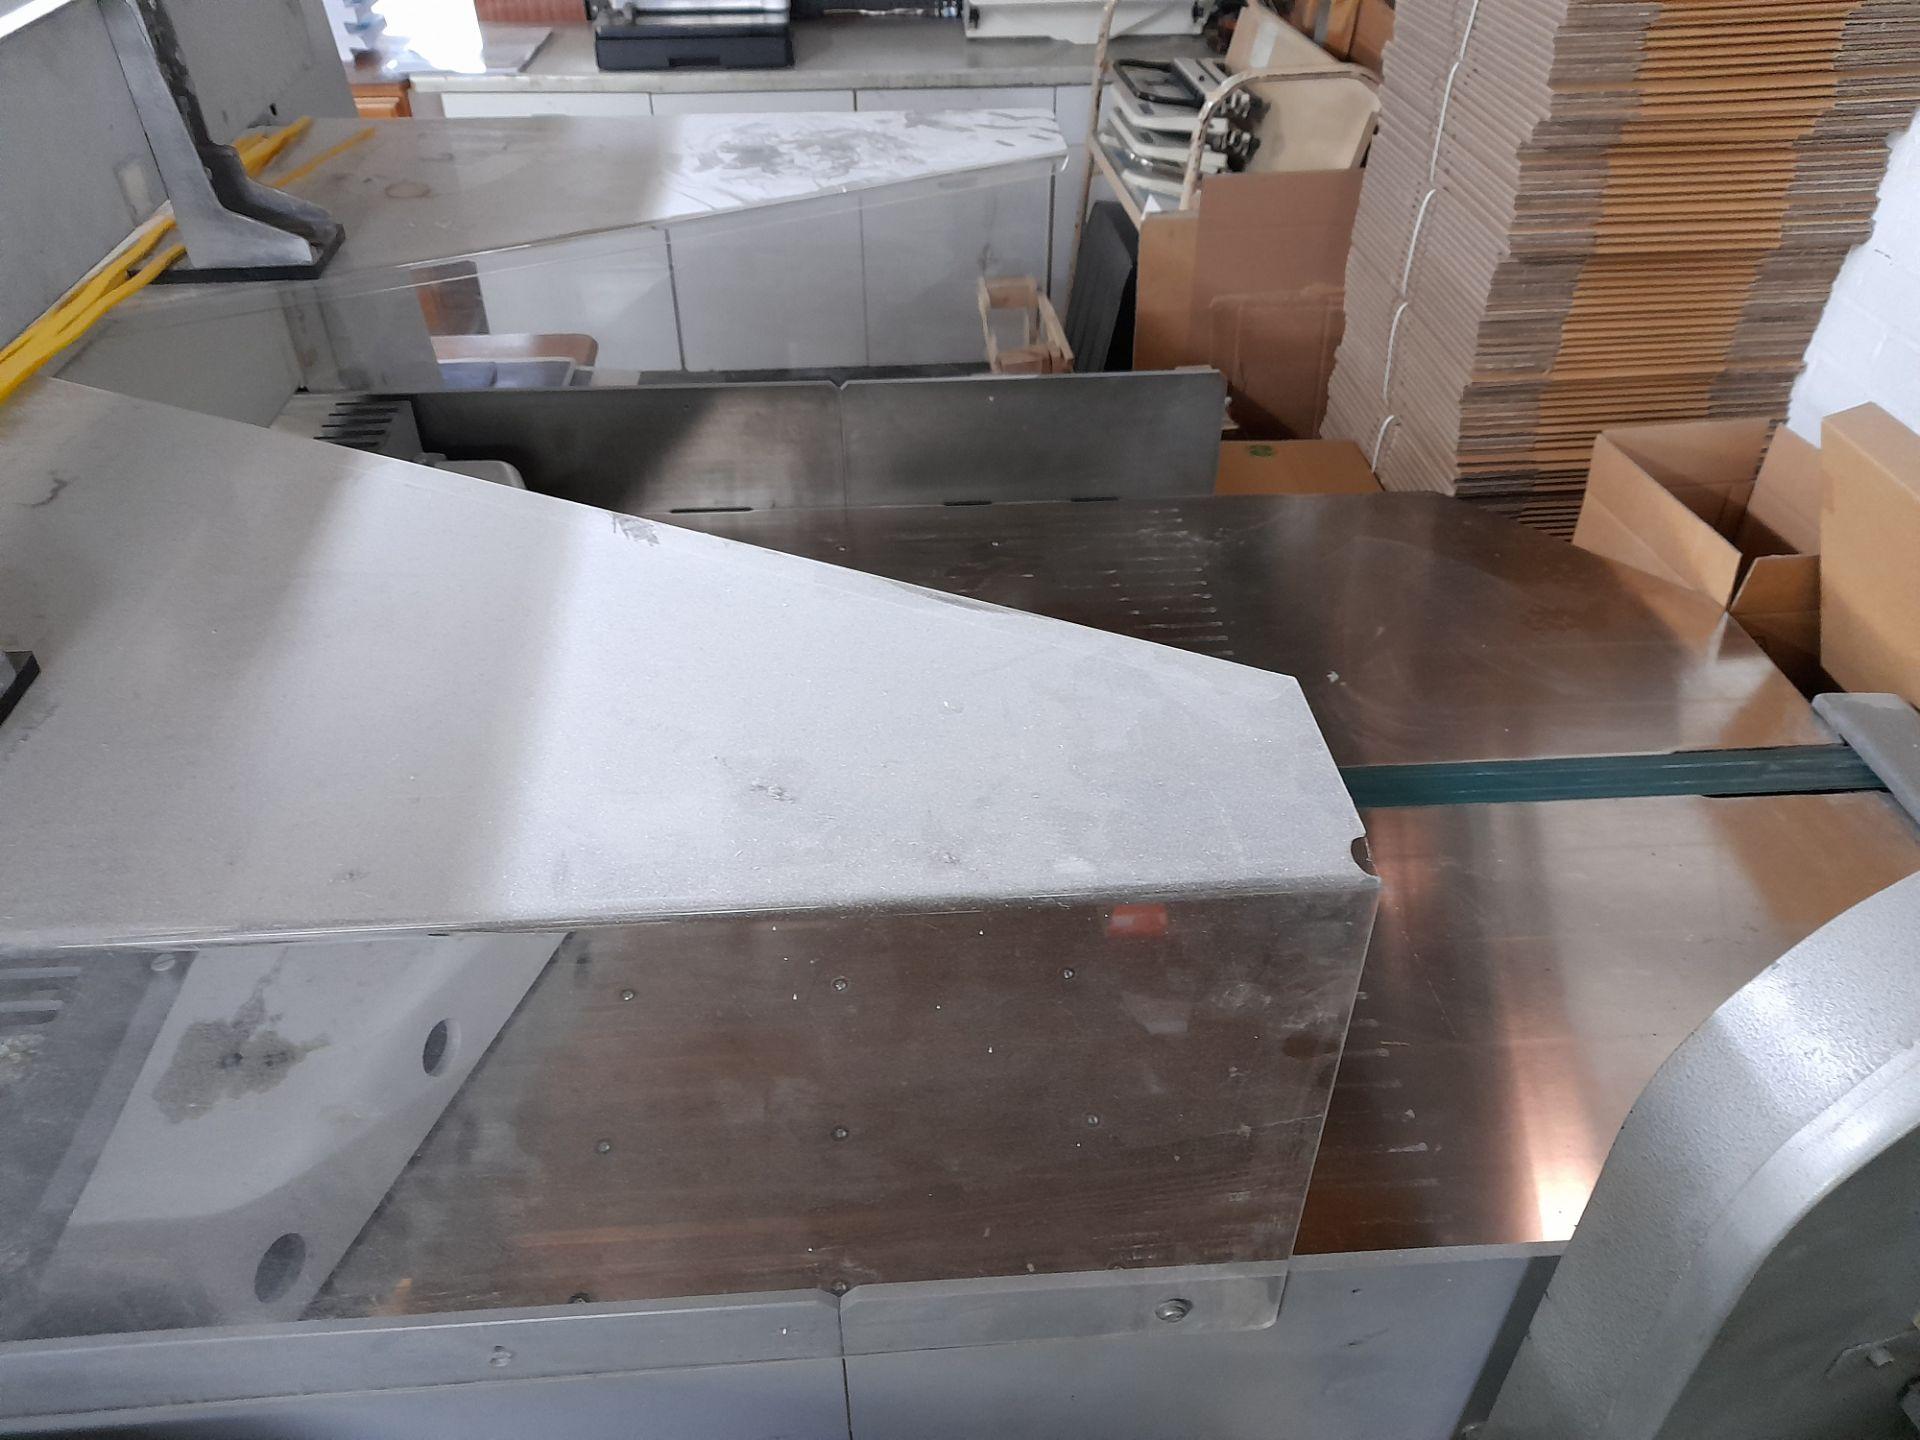 Polar Mohr 115 ED guillotine, Machine Number: 7031 - Image 9 of 9